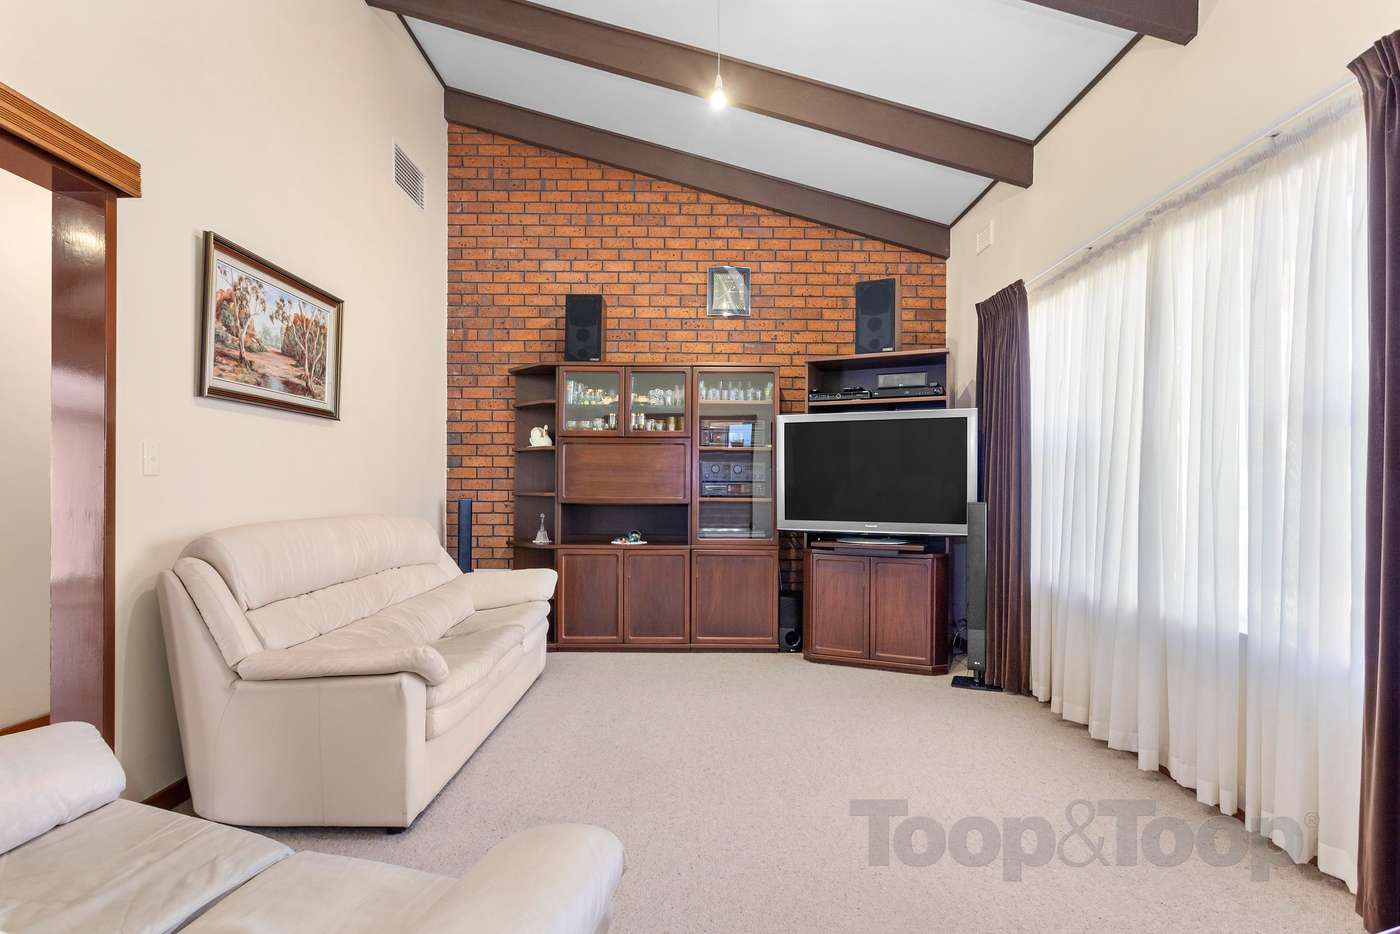 Sixth view of Homely house listing, 14 Cordoba Avenue, Gulfview Heights SA 5096